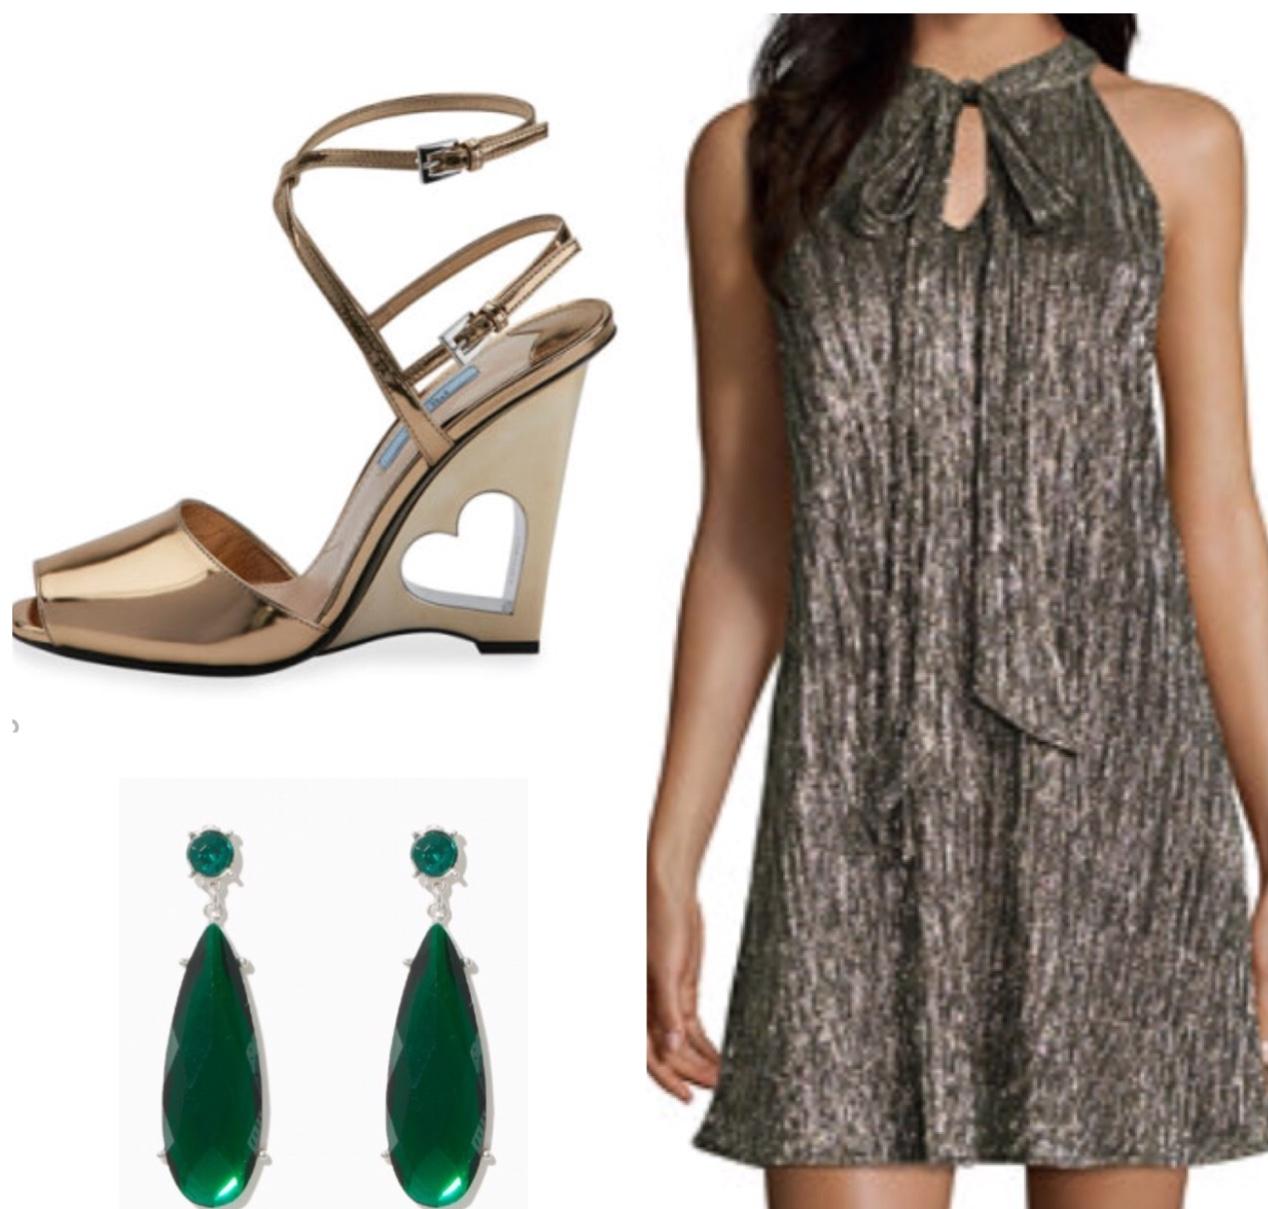 Sleeveless Dress      Teardrop Earrings      Prada Wedge Sandal